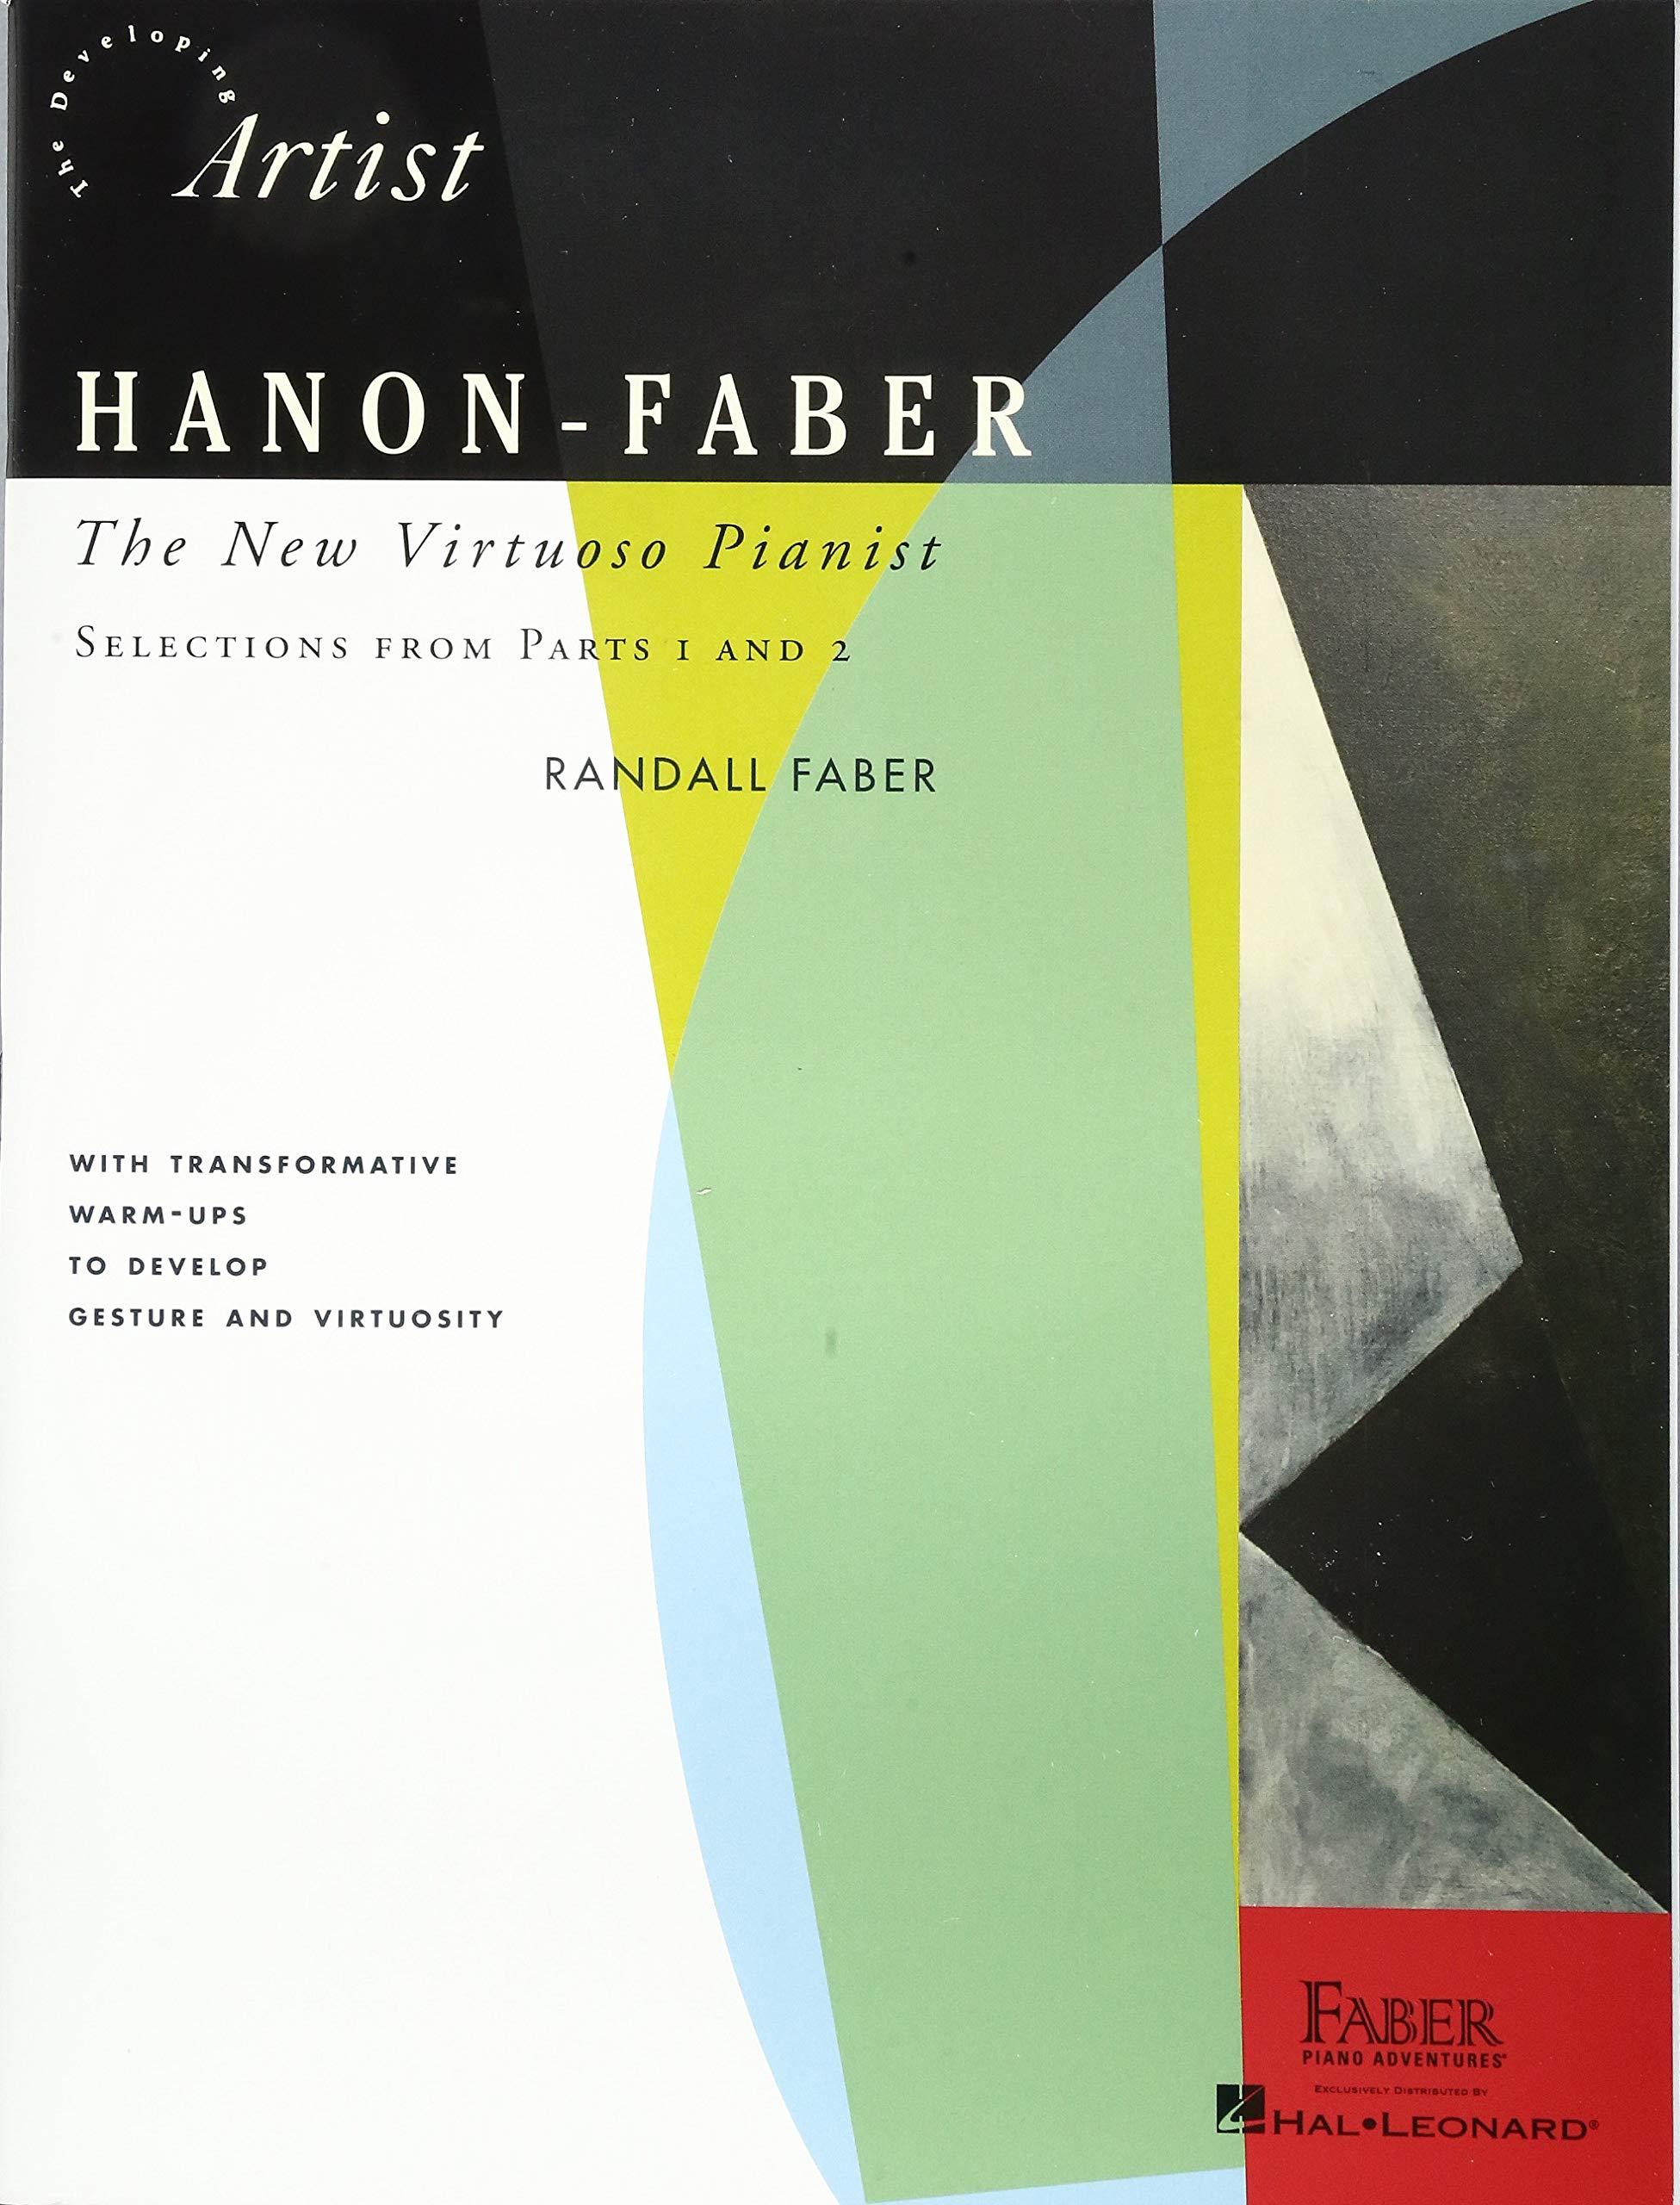 Hanon Faber: The New Virtuoso Pianist